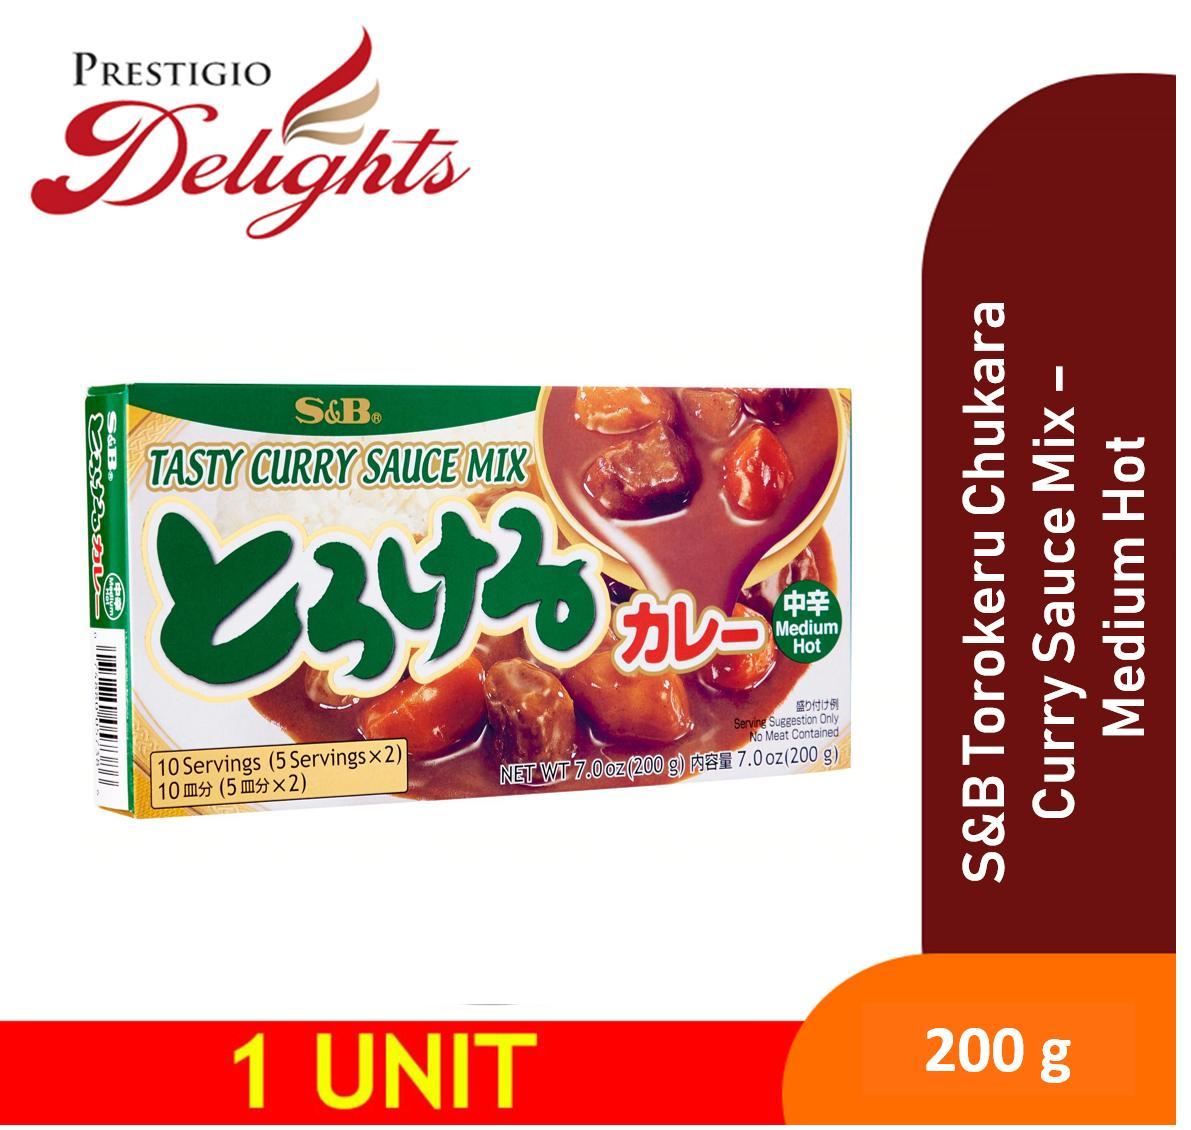 S&b Torokeru Chukara Curry Sauce Mix - Medium Hot 200g By Prestigio Delights.